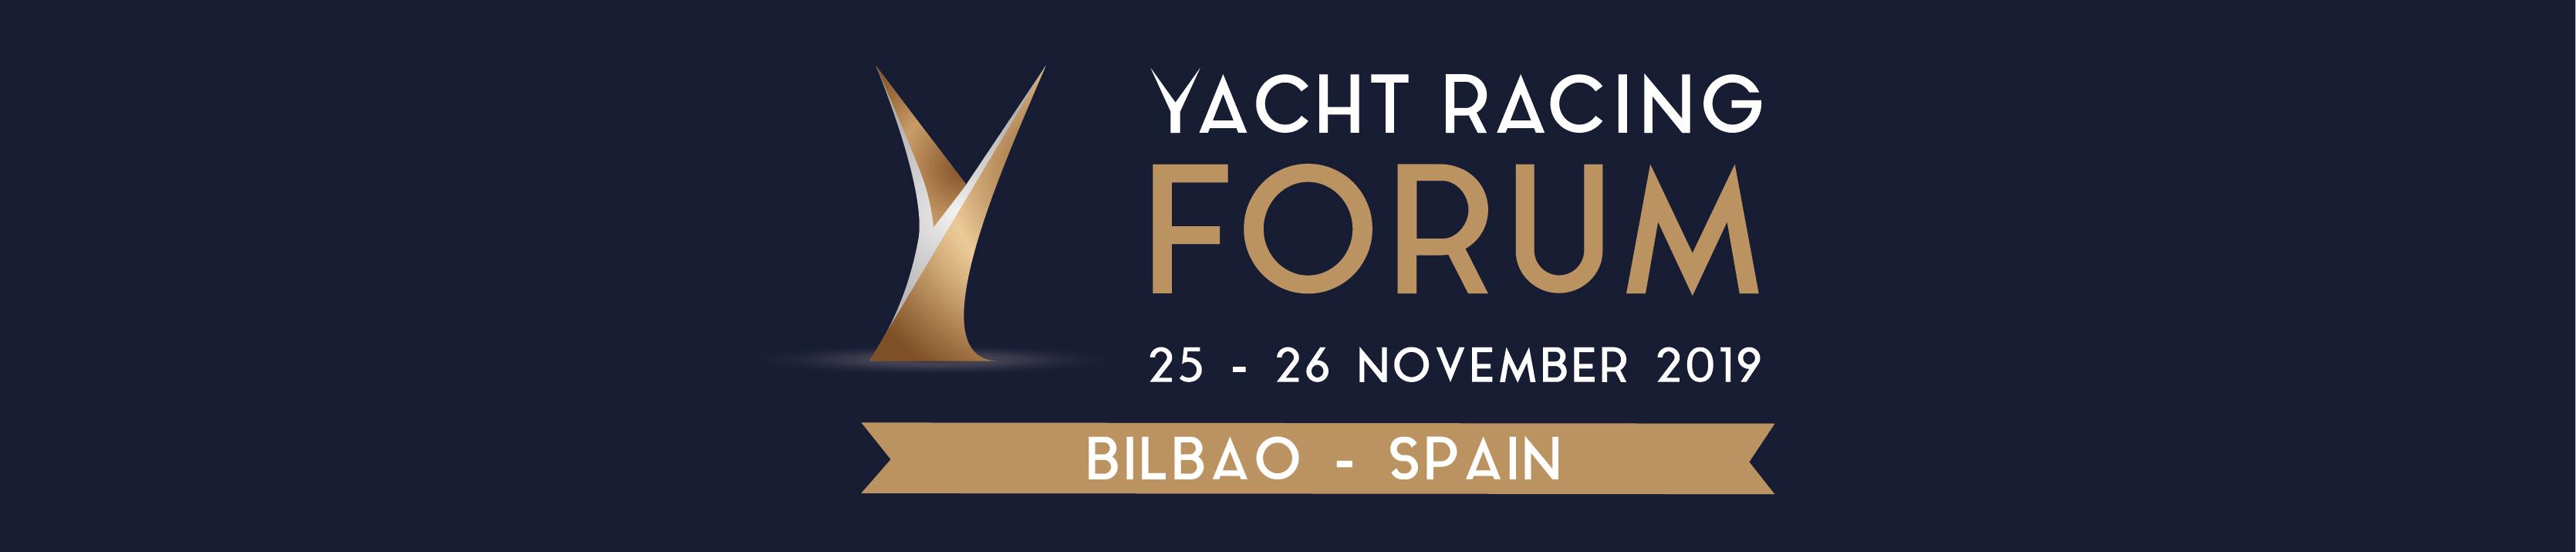 Yacht Racing Forum